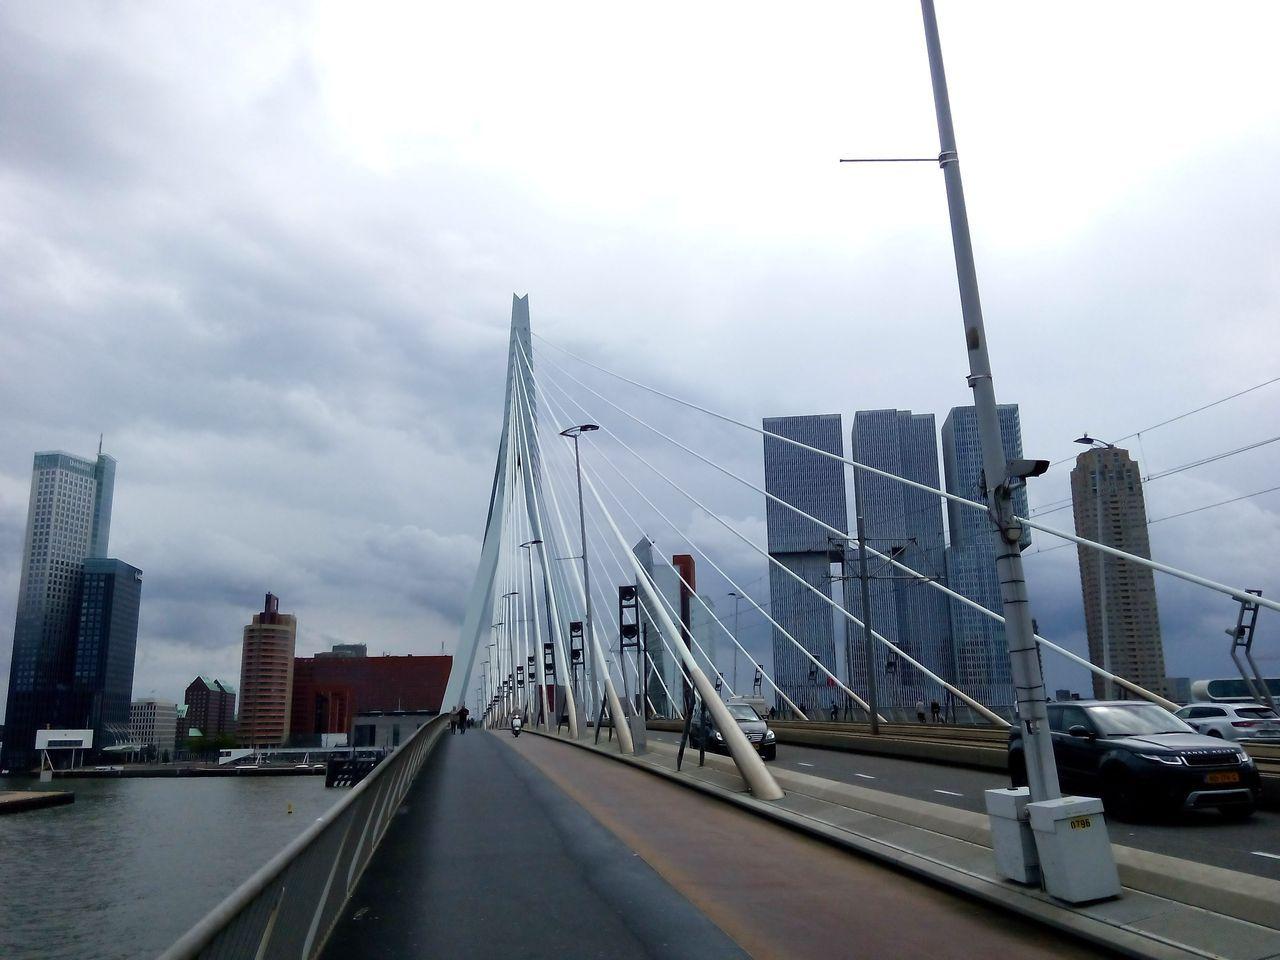 Le pont Erasme